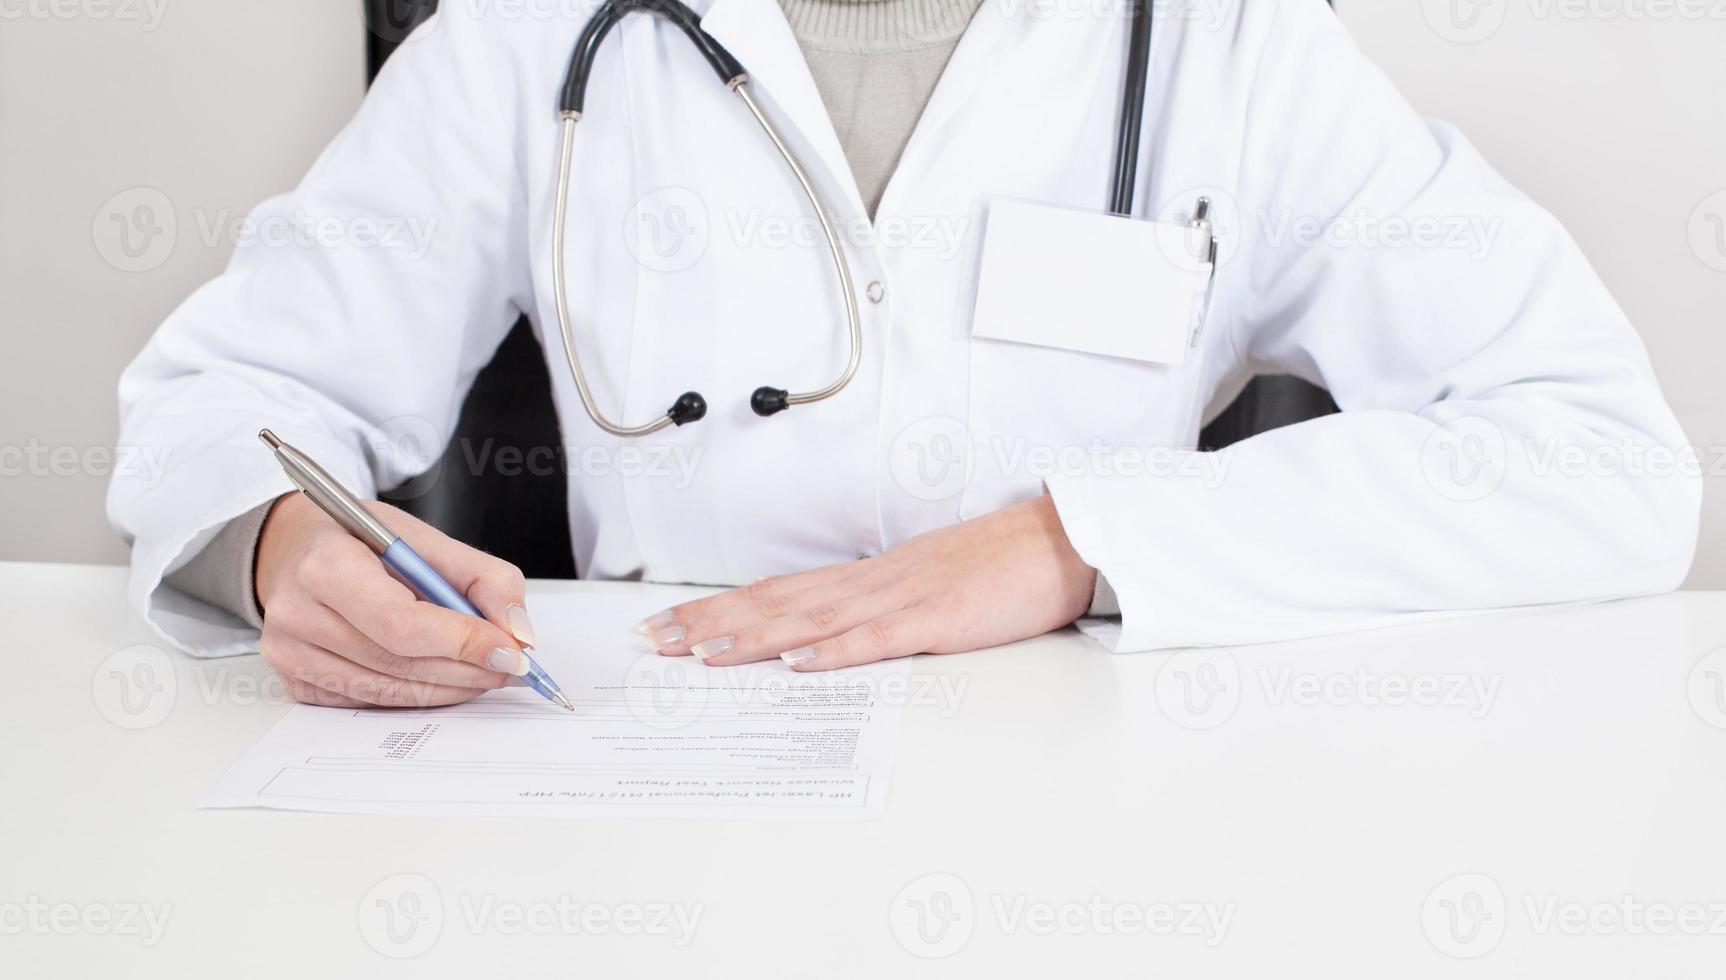 dokter schrijft recept foto